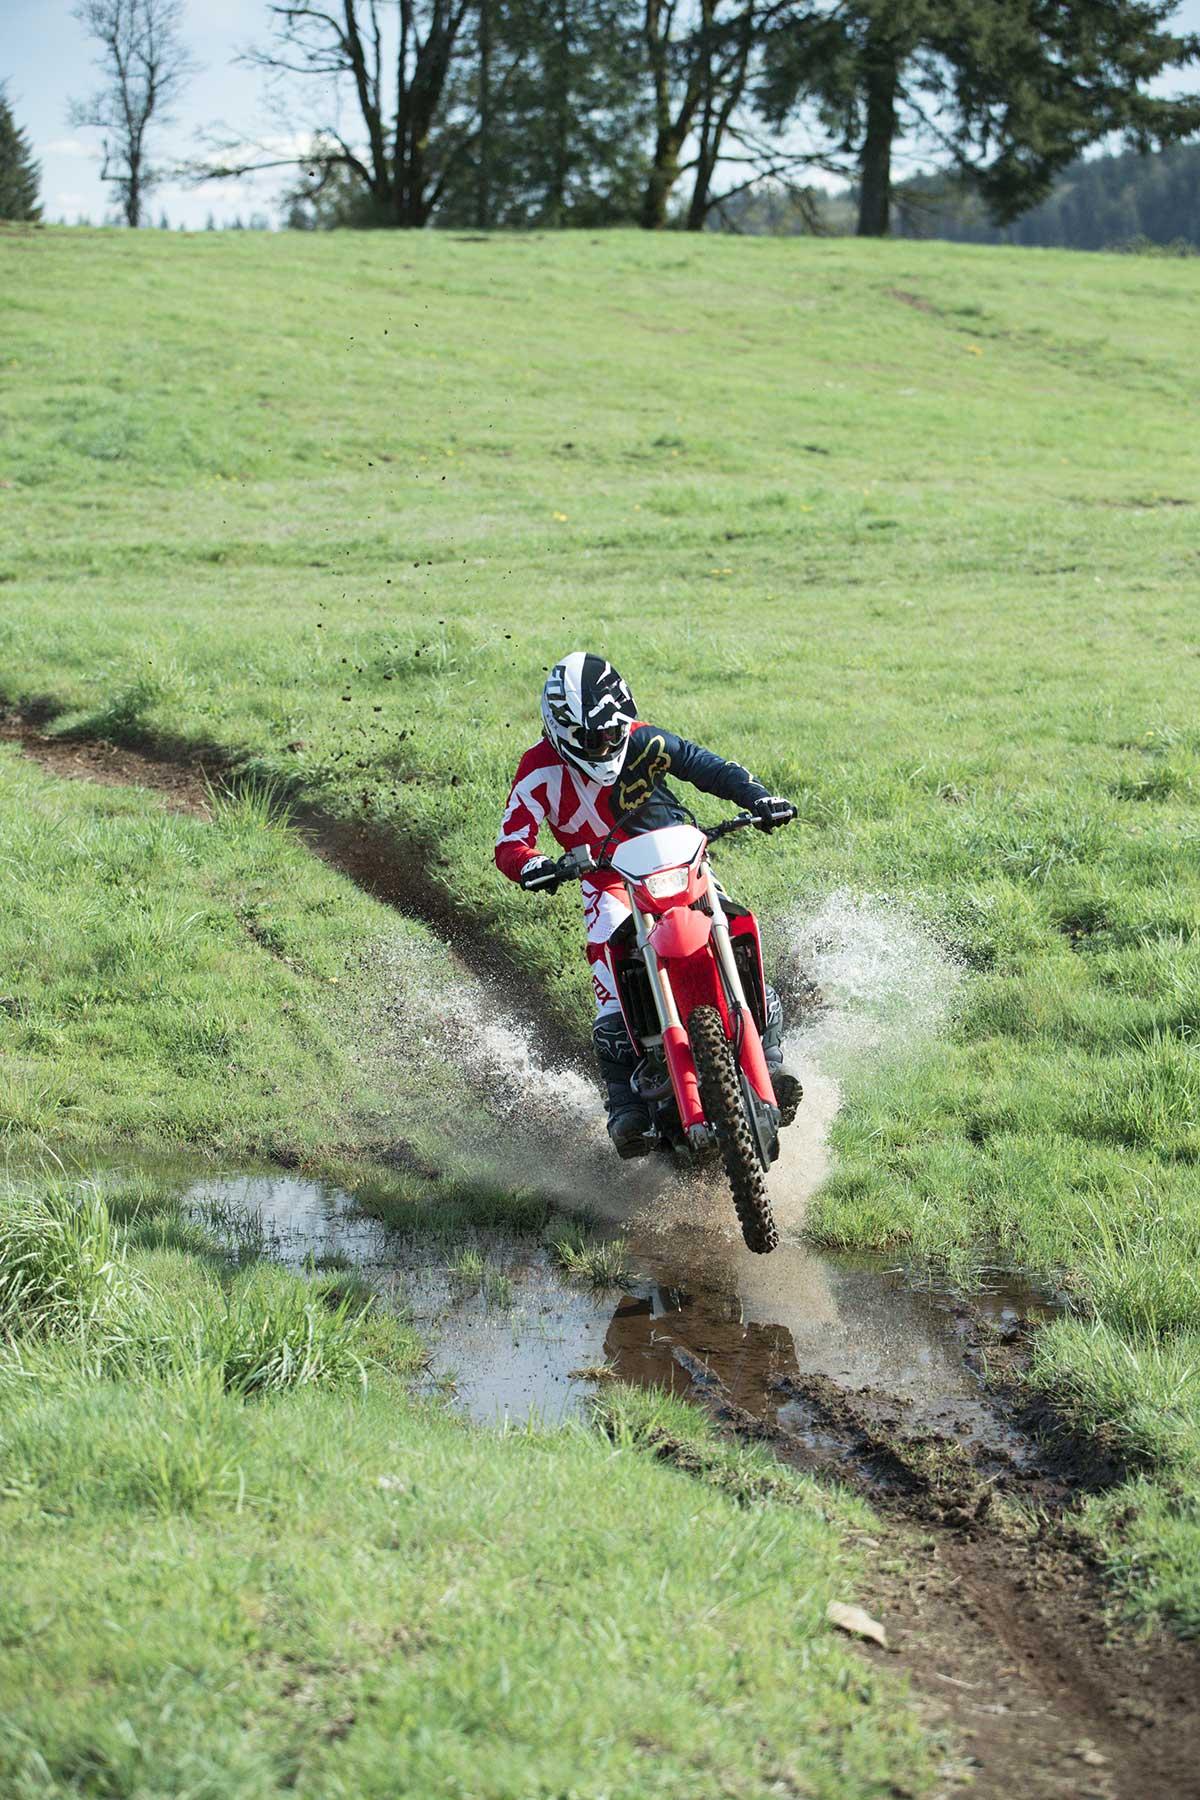 19-Honda-CRF450X_Action_2.jpg